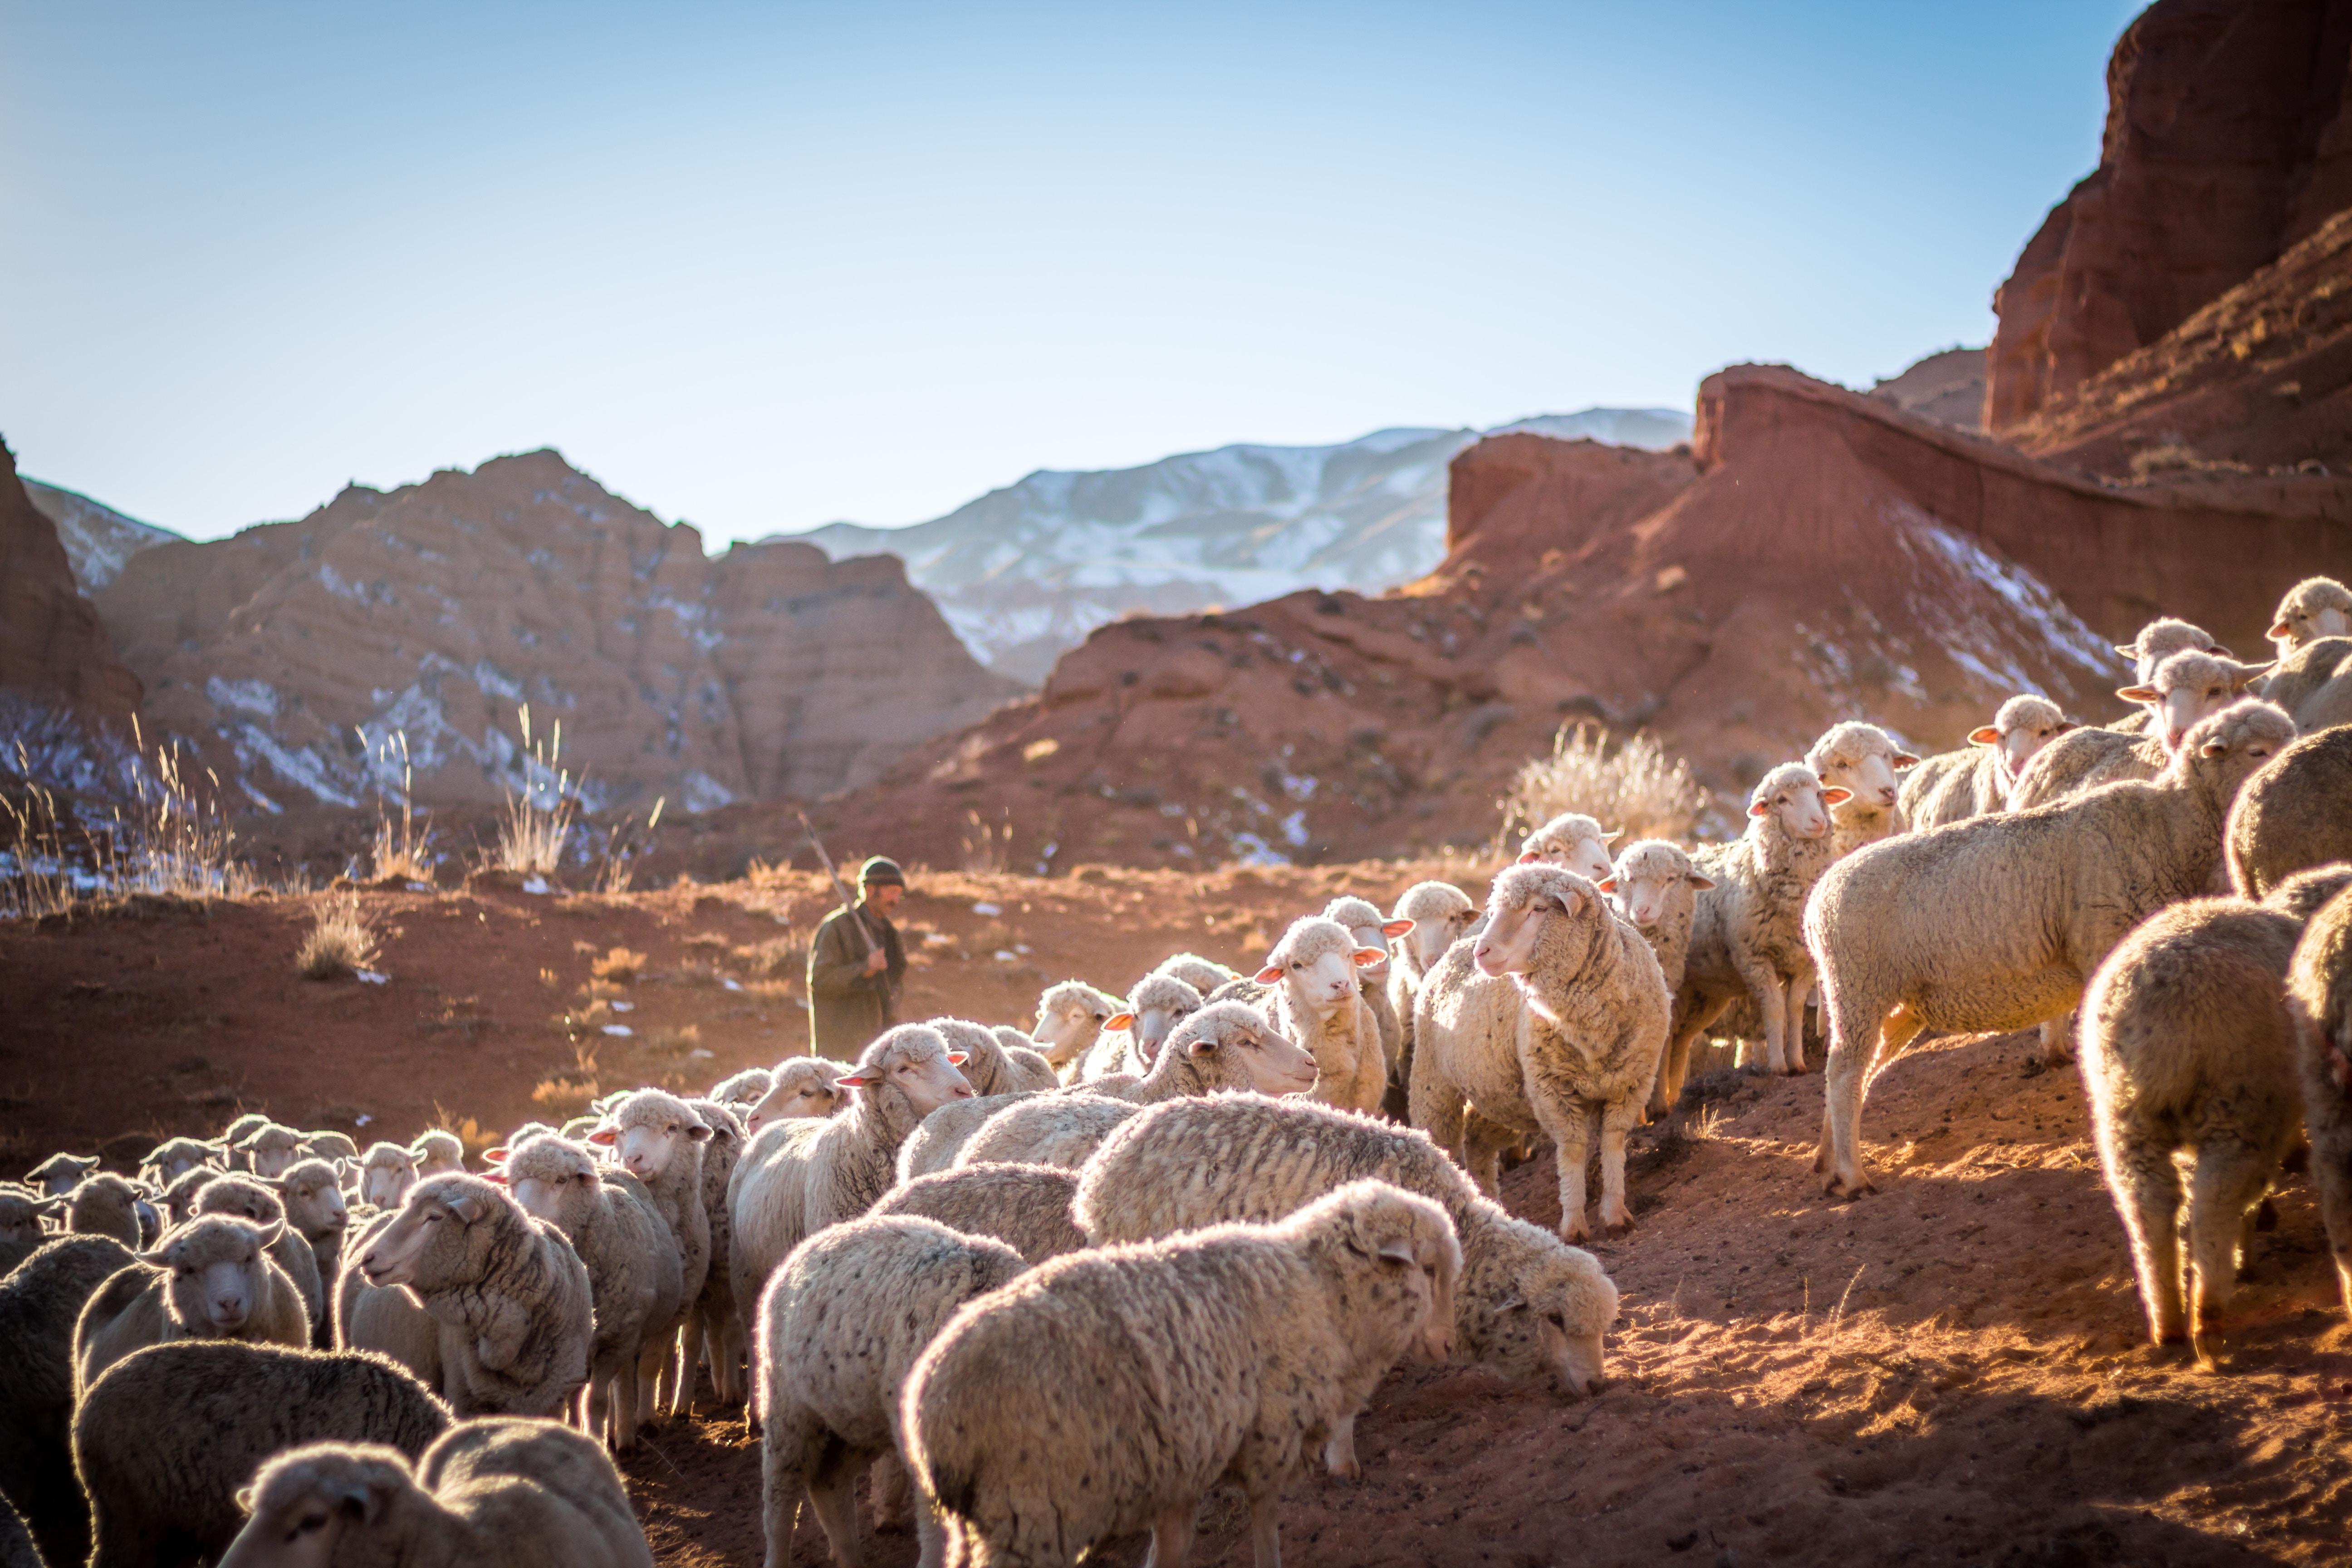 Farmer herds sheep on the mountain in Kyrgyzstan